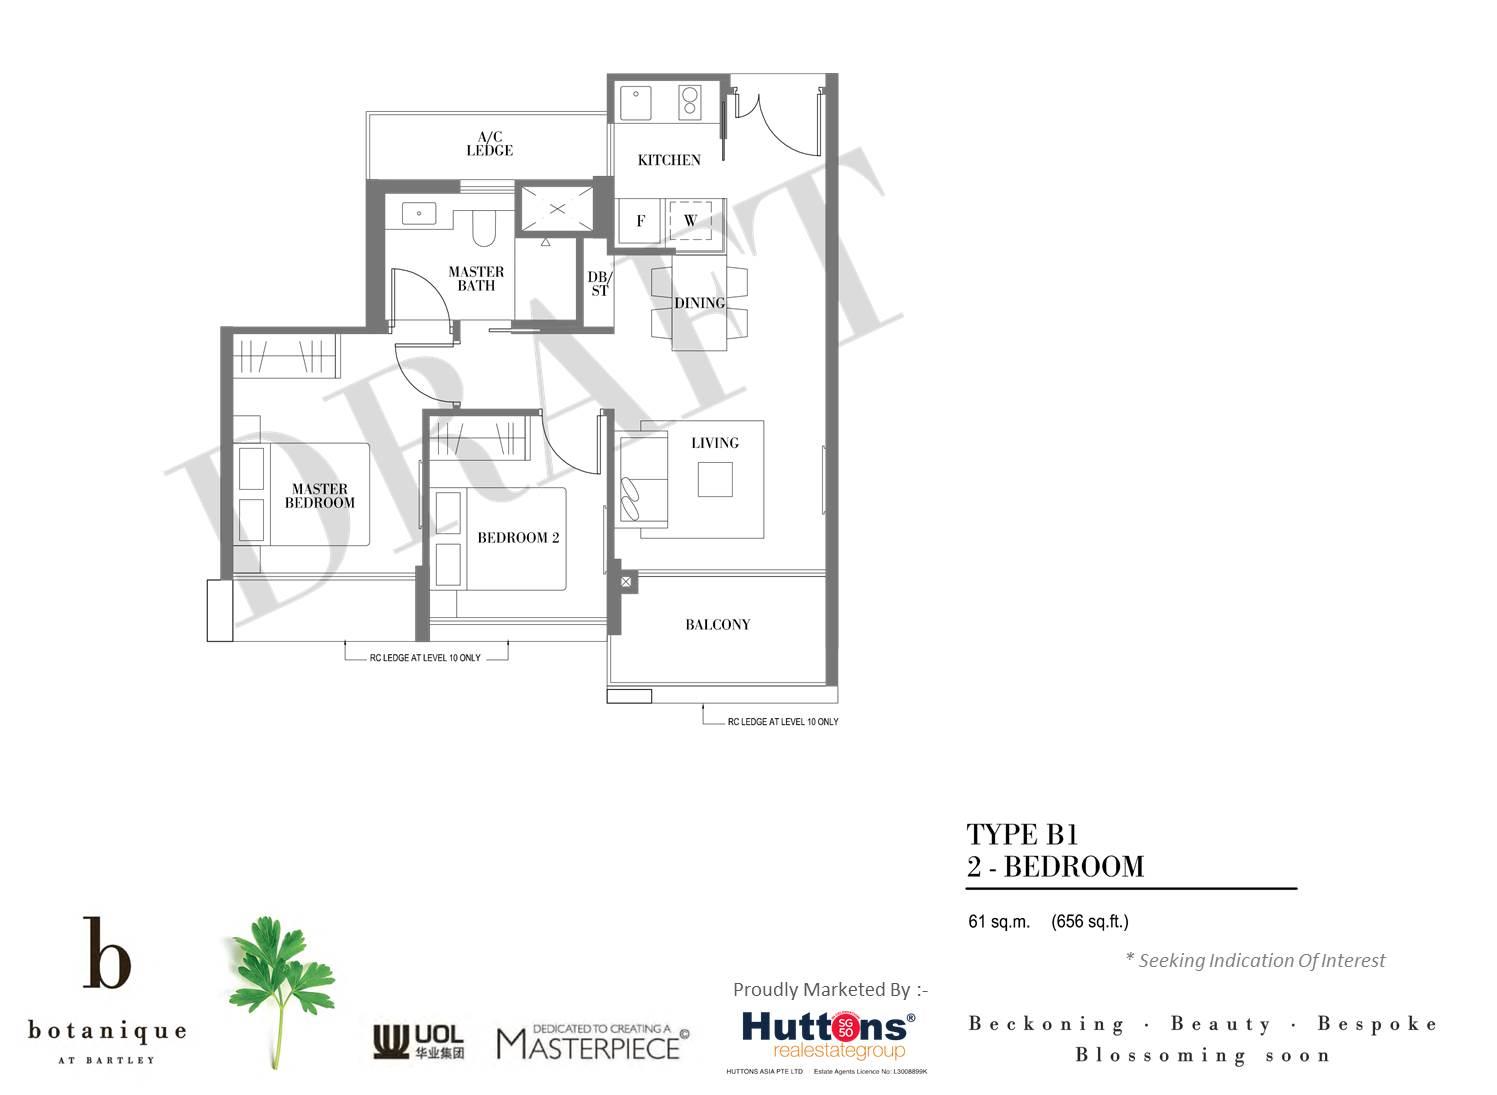 Botanique Bartley bedroom plans botanique @ bartley Botanique @ Bartley By UOL  Showflat Hotline +65 61007122  Bartley MRT 54ec29b14c4642015 02 24 03 35 13